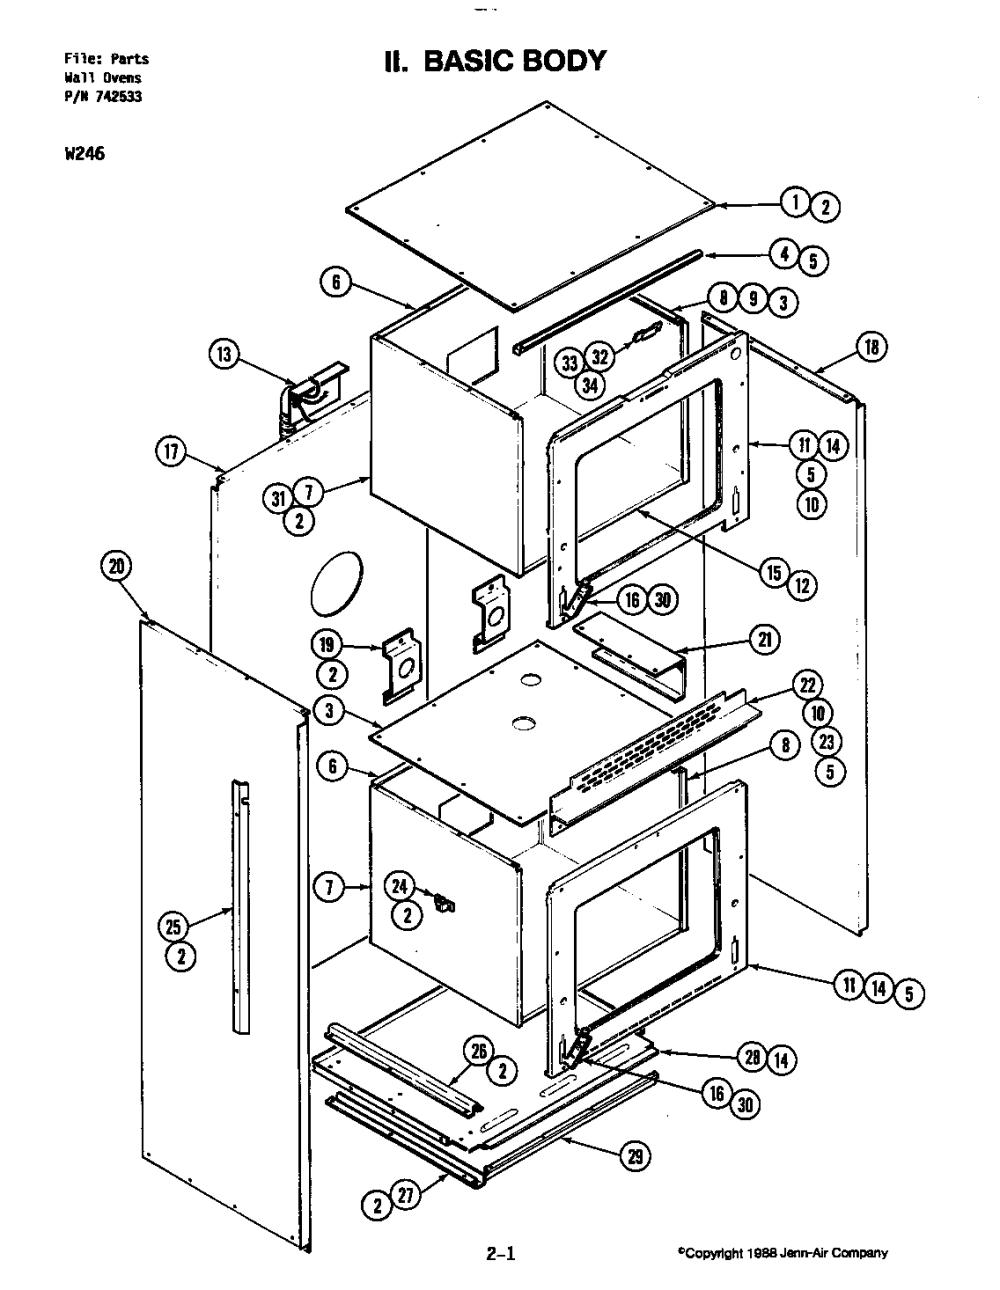 medium resolution of w246 electric wall oven basic body w246 w246 parts diagram